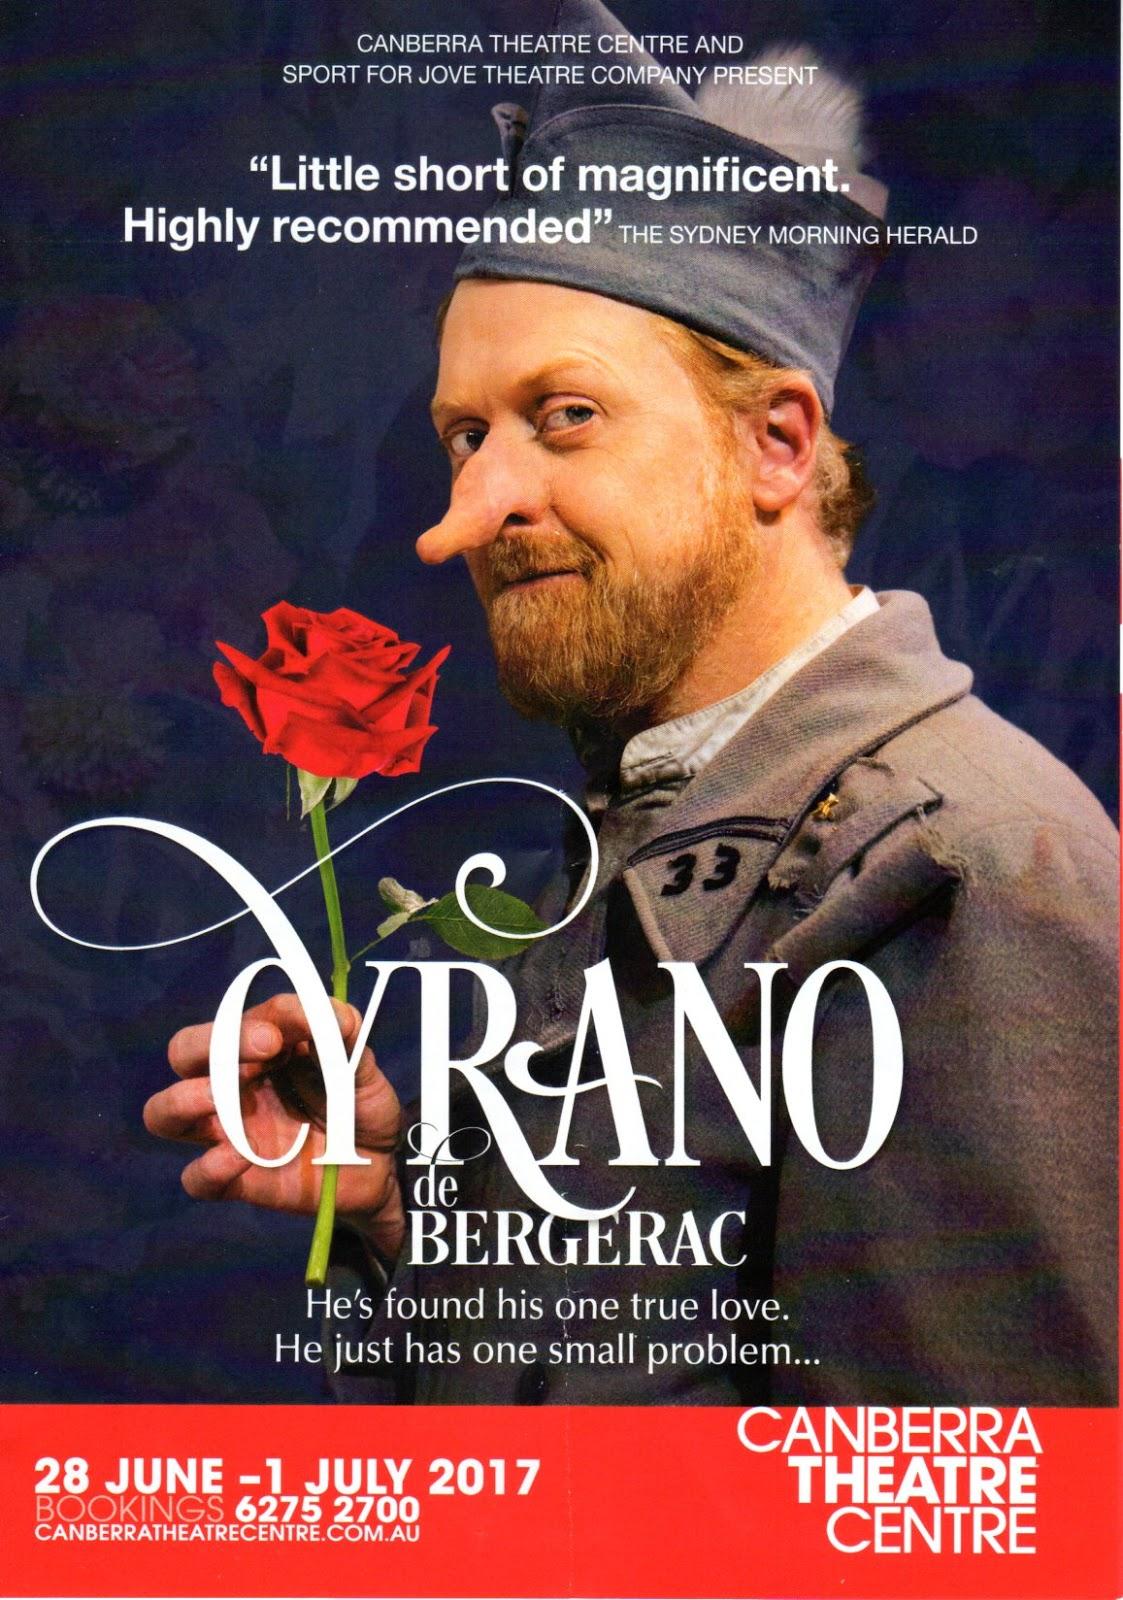 Canberra Critics Circle Cyrano De Bergerac